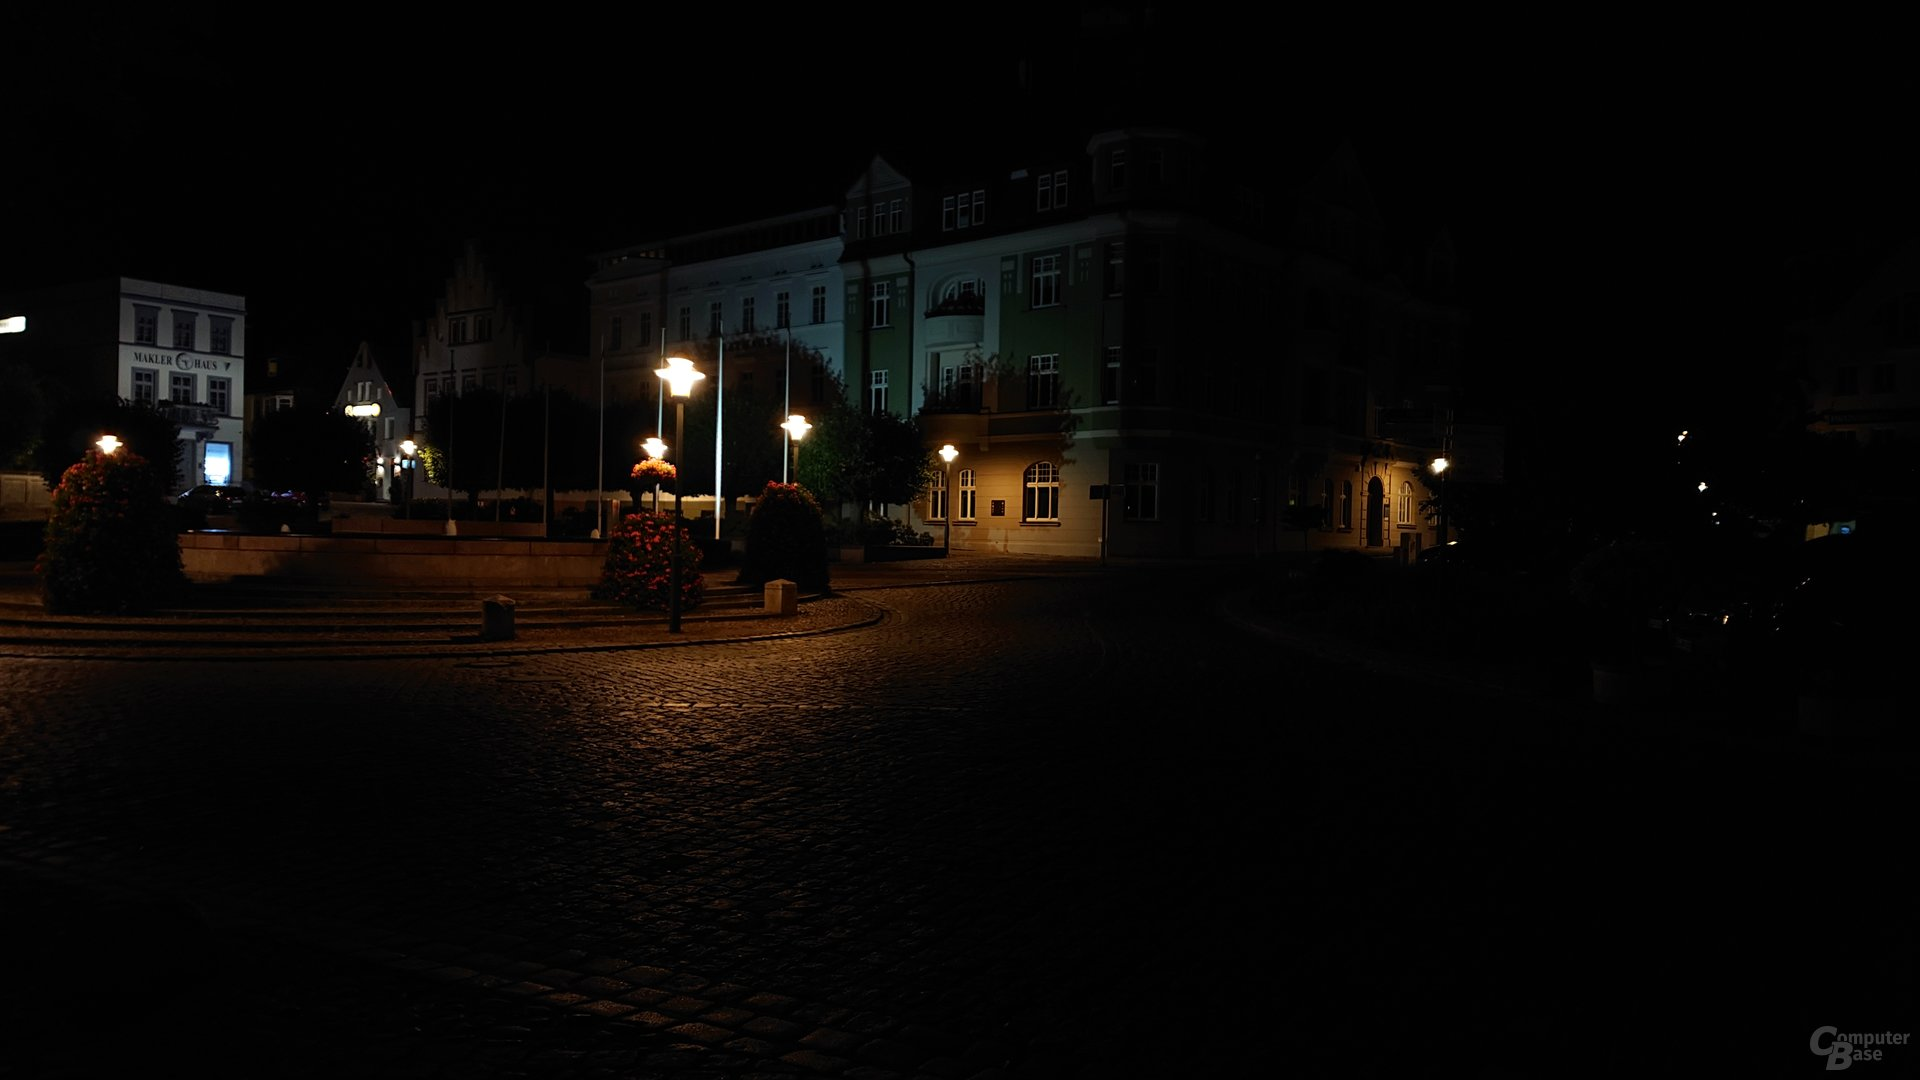 Nachtaufnahme, Duallinse, ISO 200